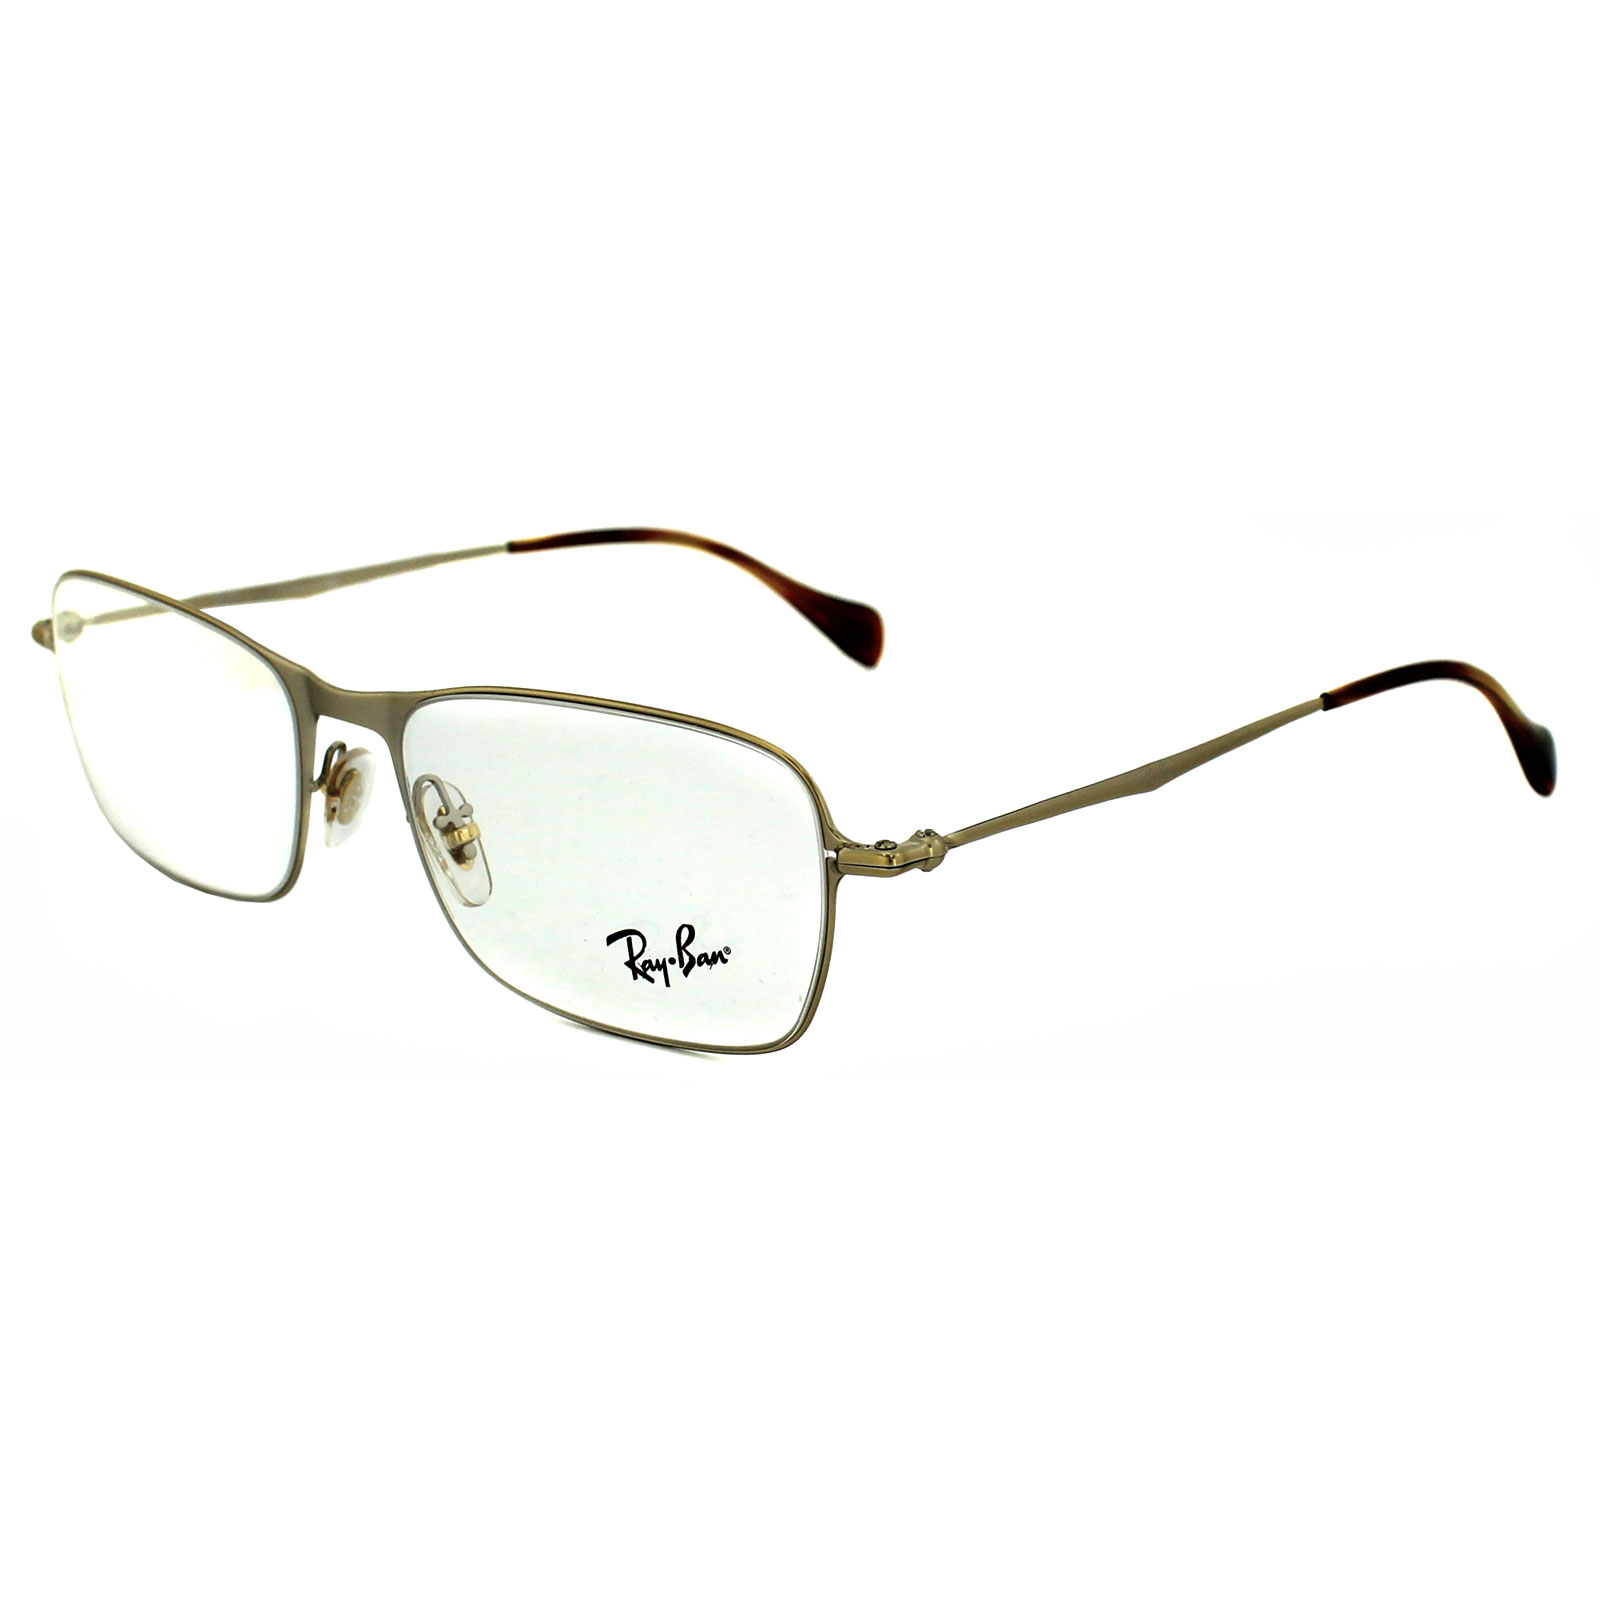 Ray-Ban Glasses Frames 6253 2754 Semi Shiny Gold eBay